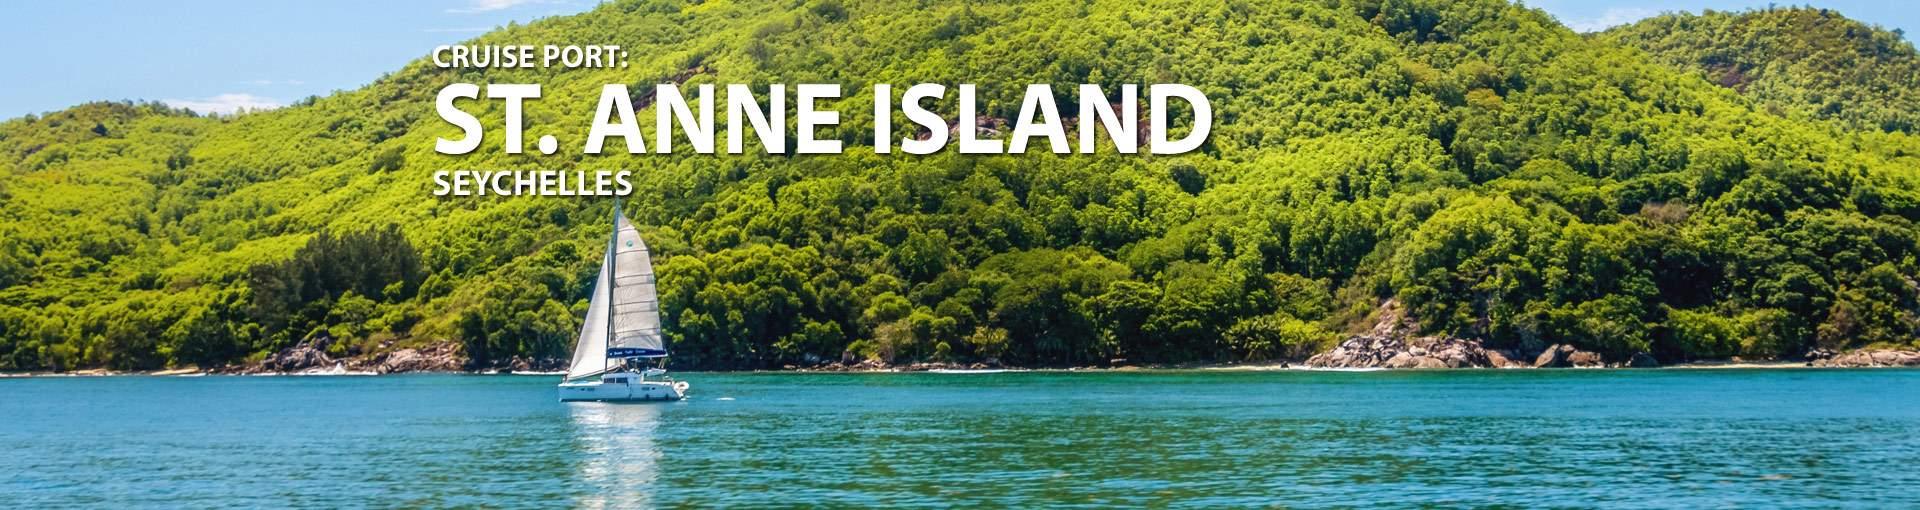 Banner for St. Anne Island, Seychelles